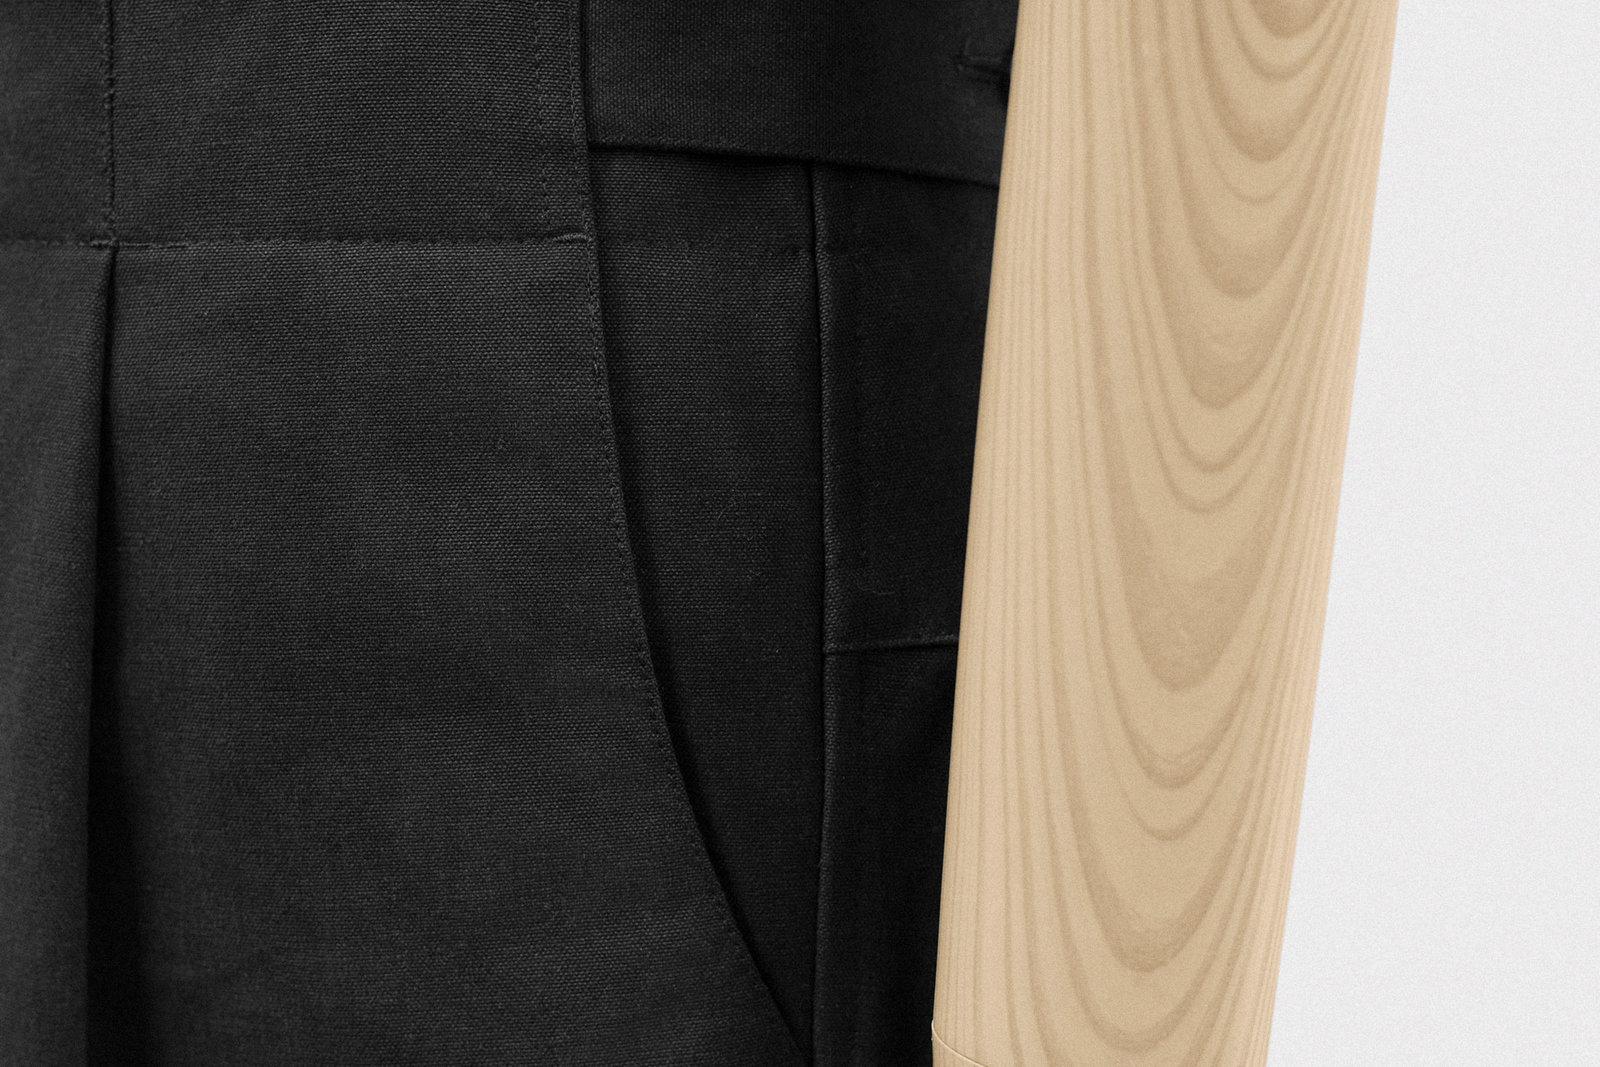 field-trousers-cotton-black-3@2x.jpeg